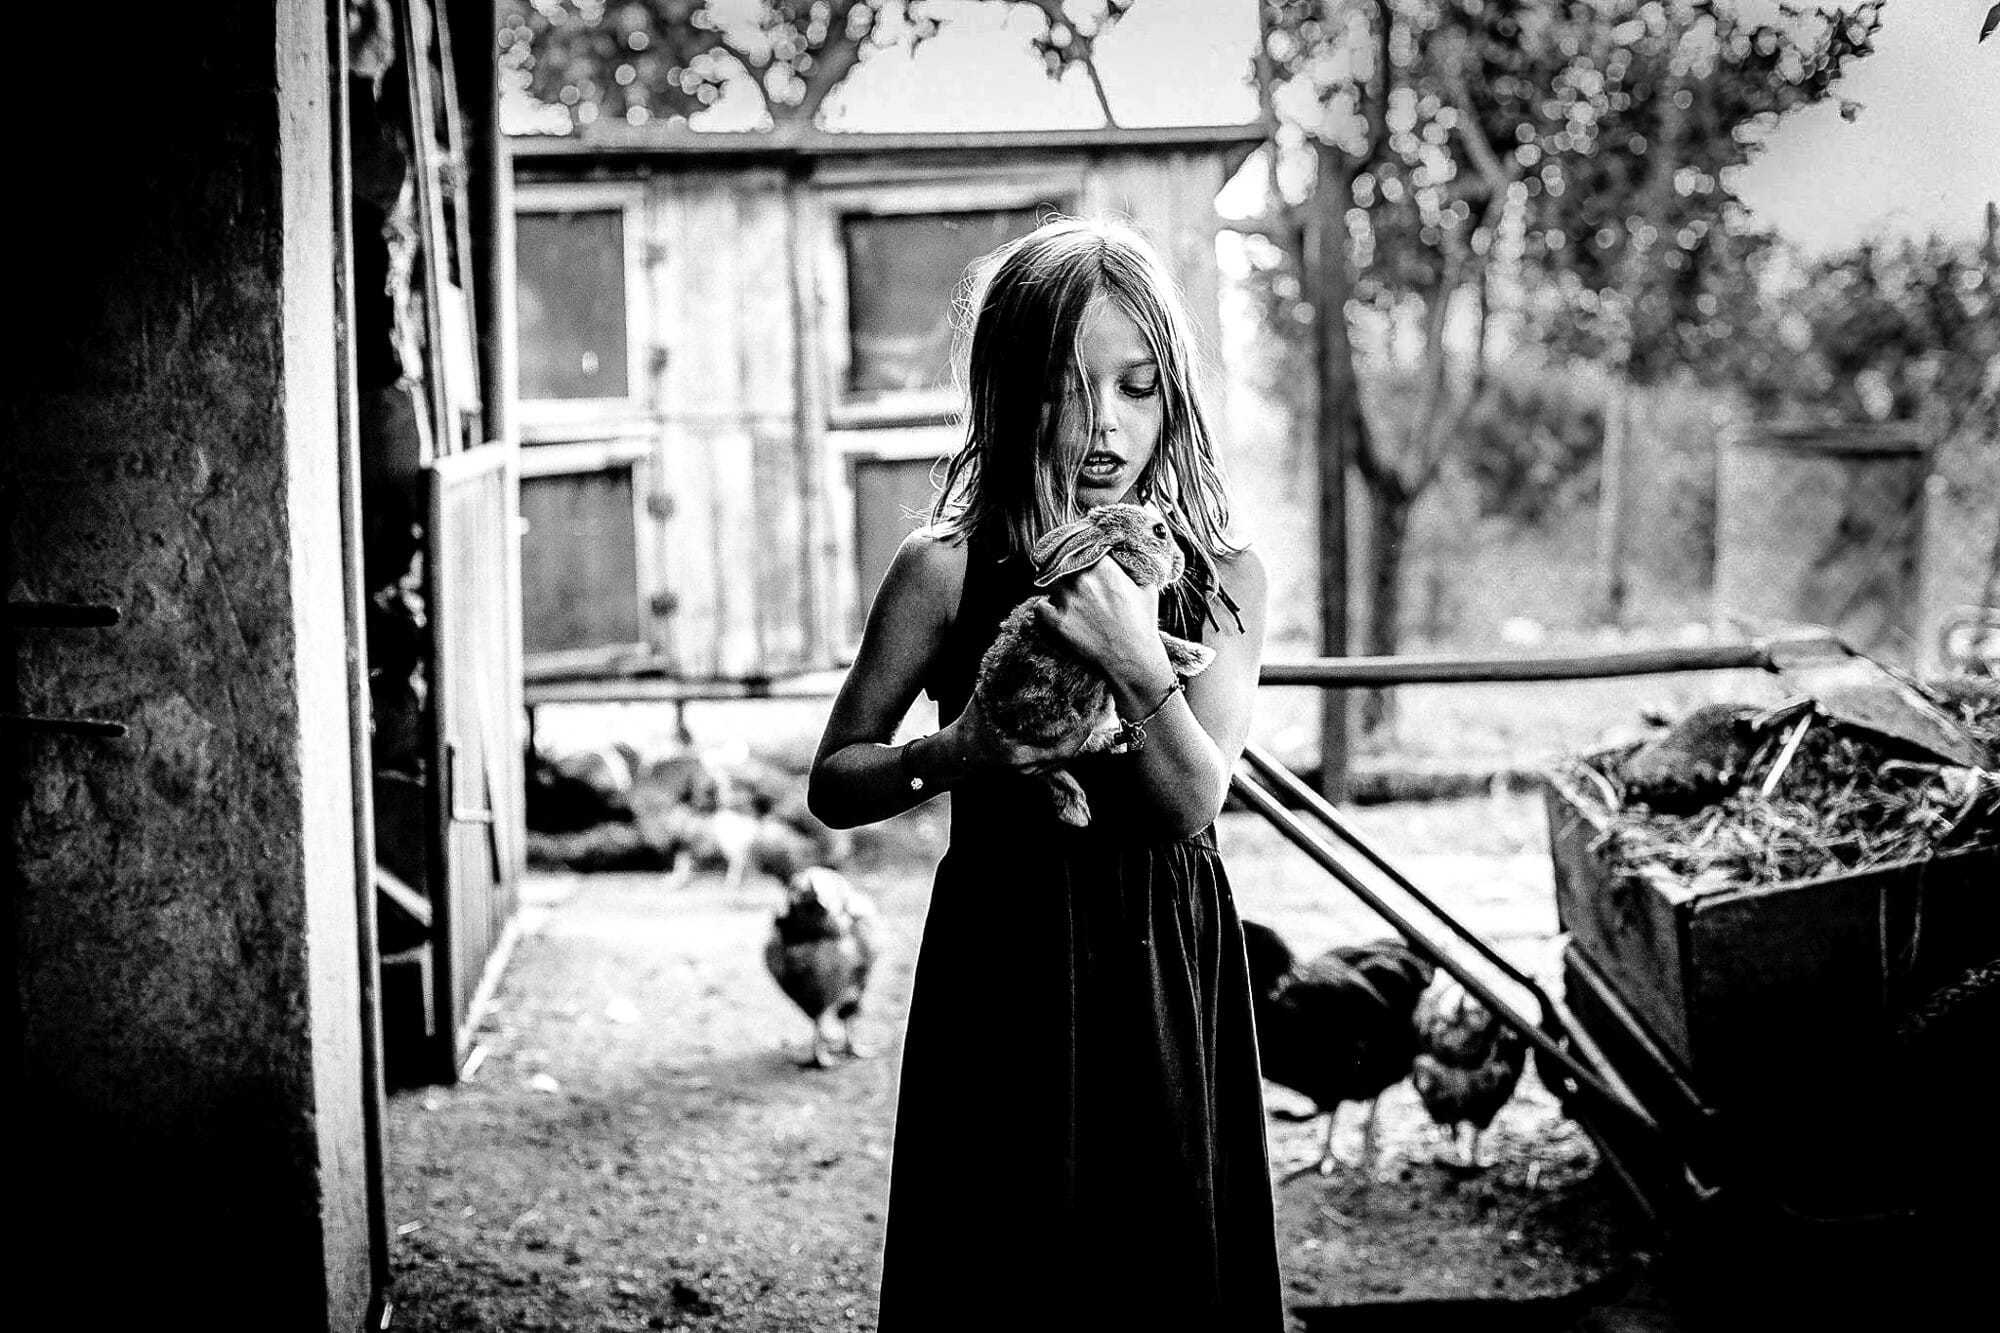 Petra Bernardi Stevcikova / Rencontre avec l'instant 1